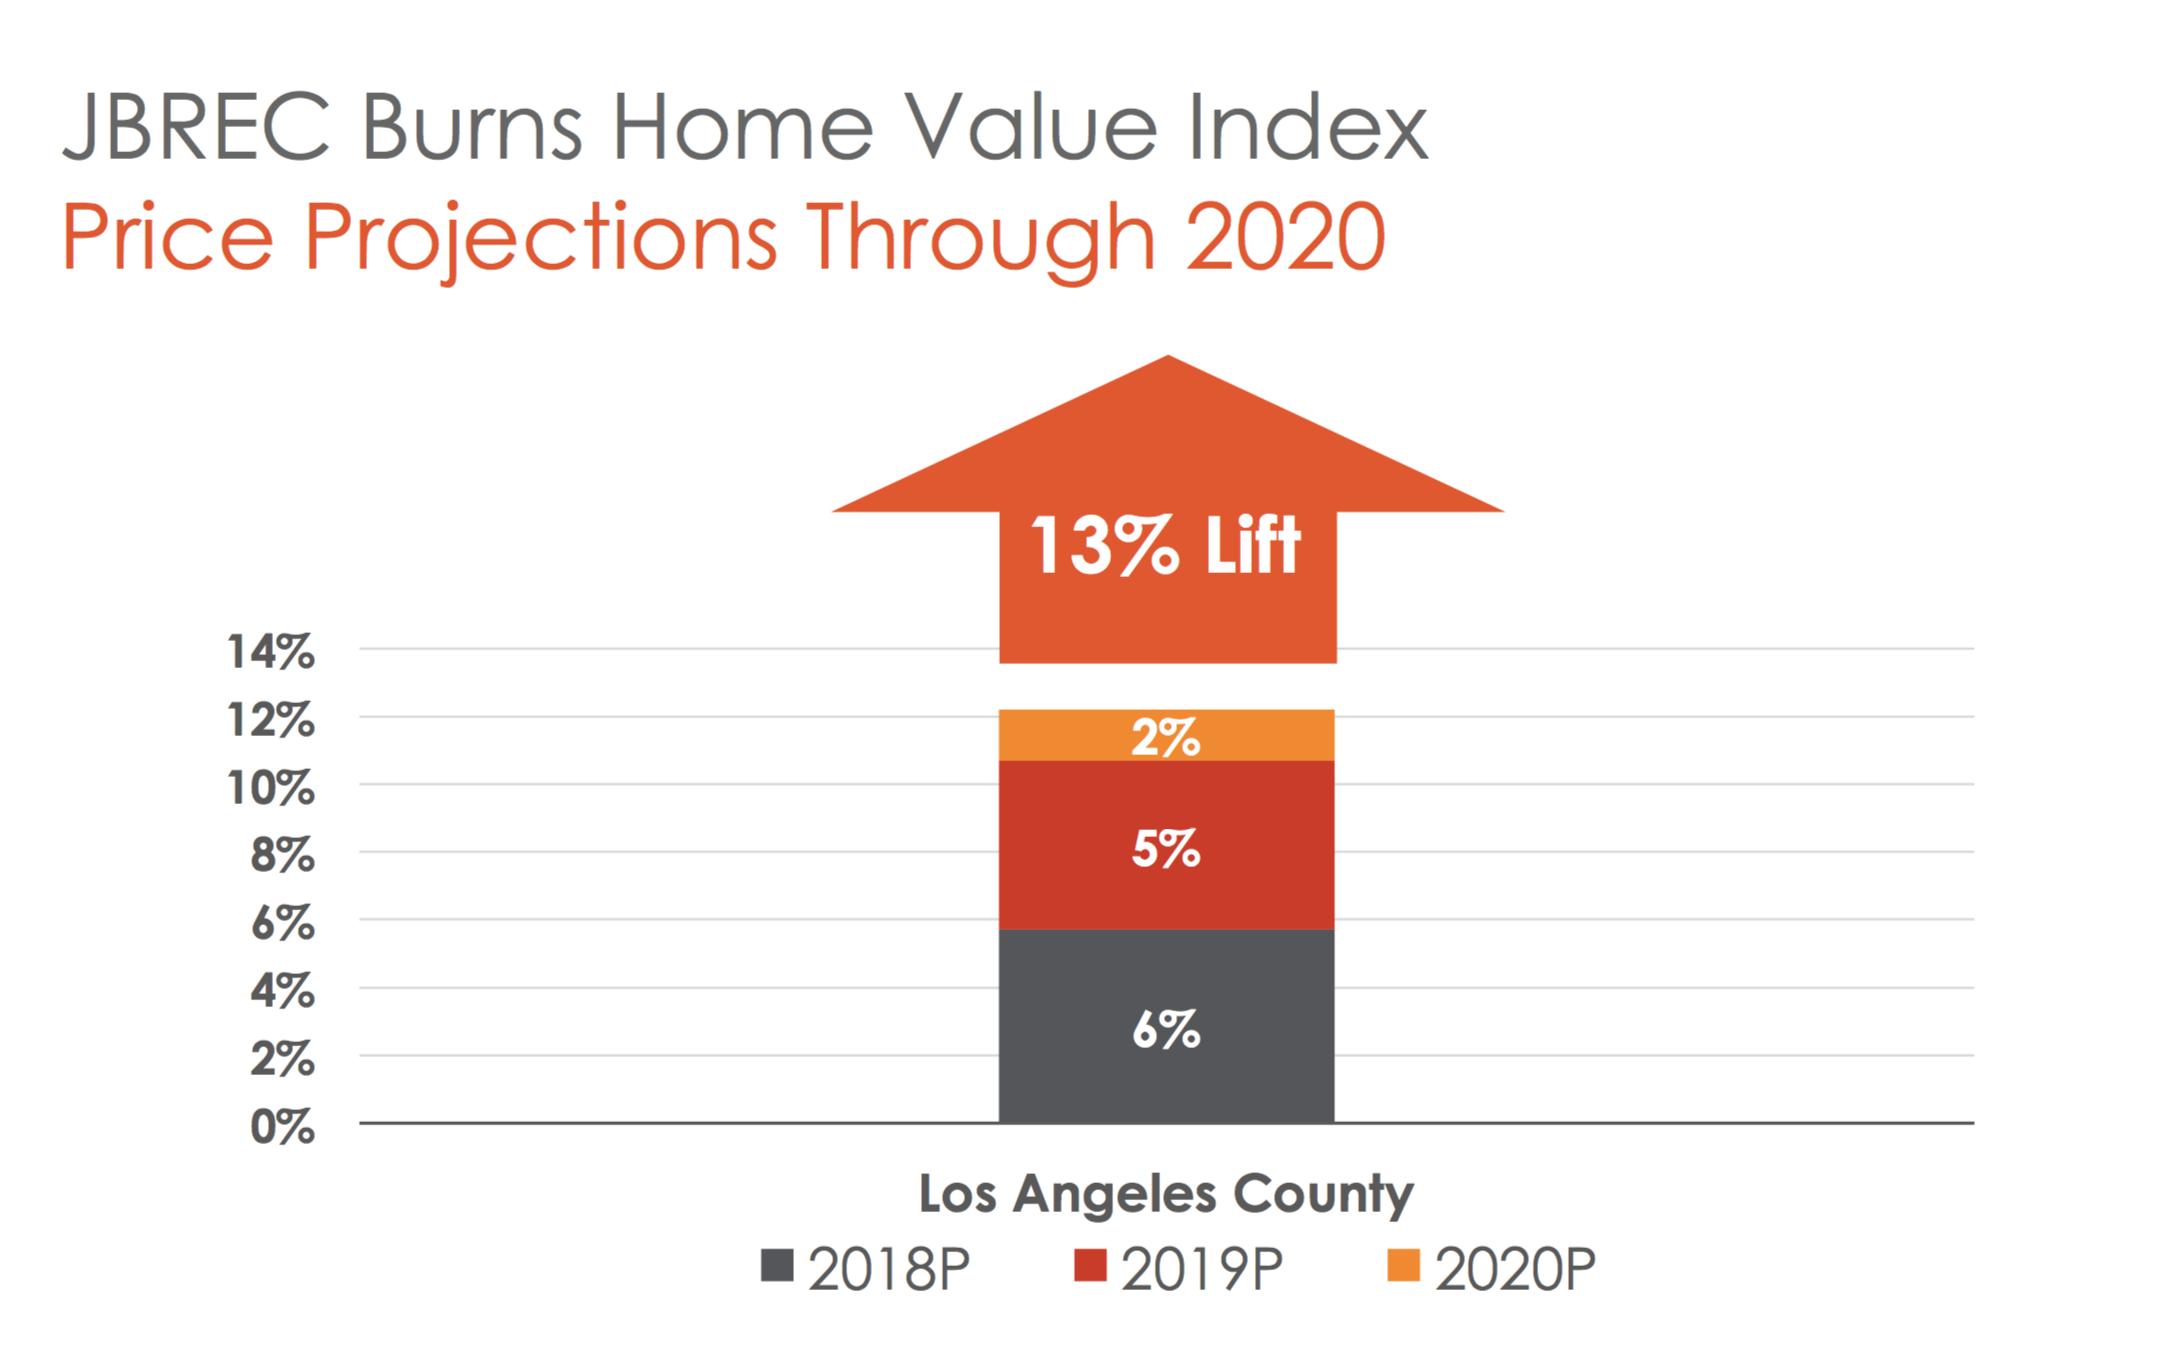 Price Predictions